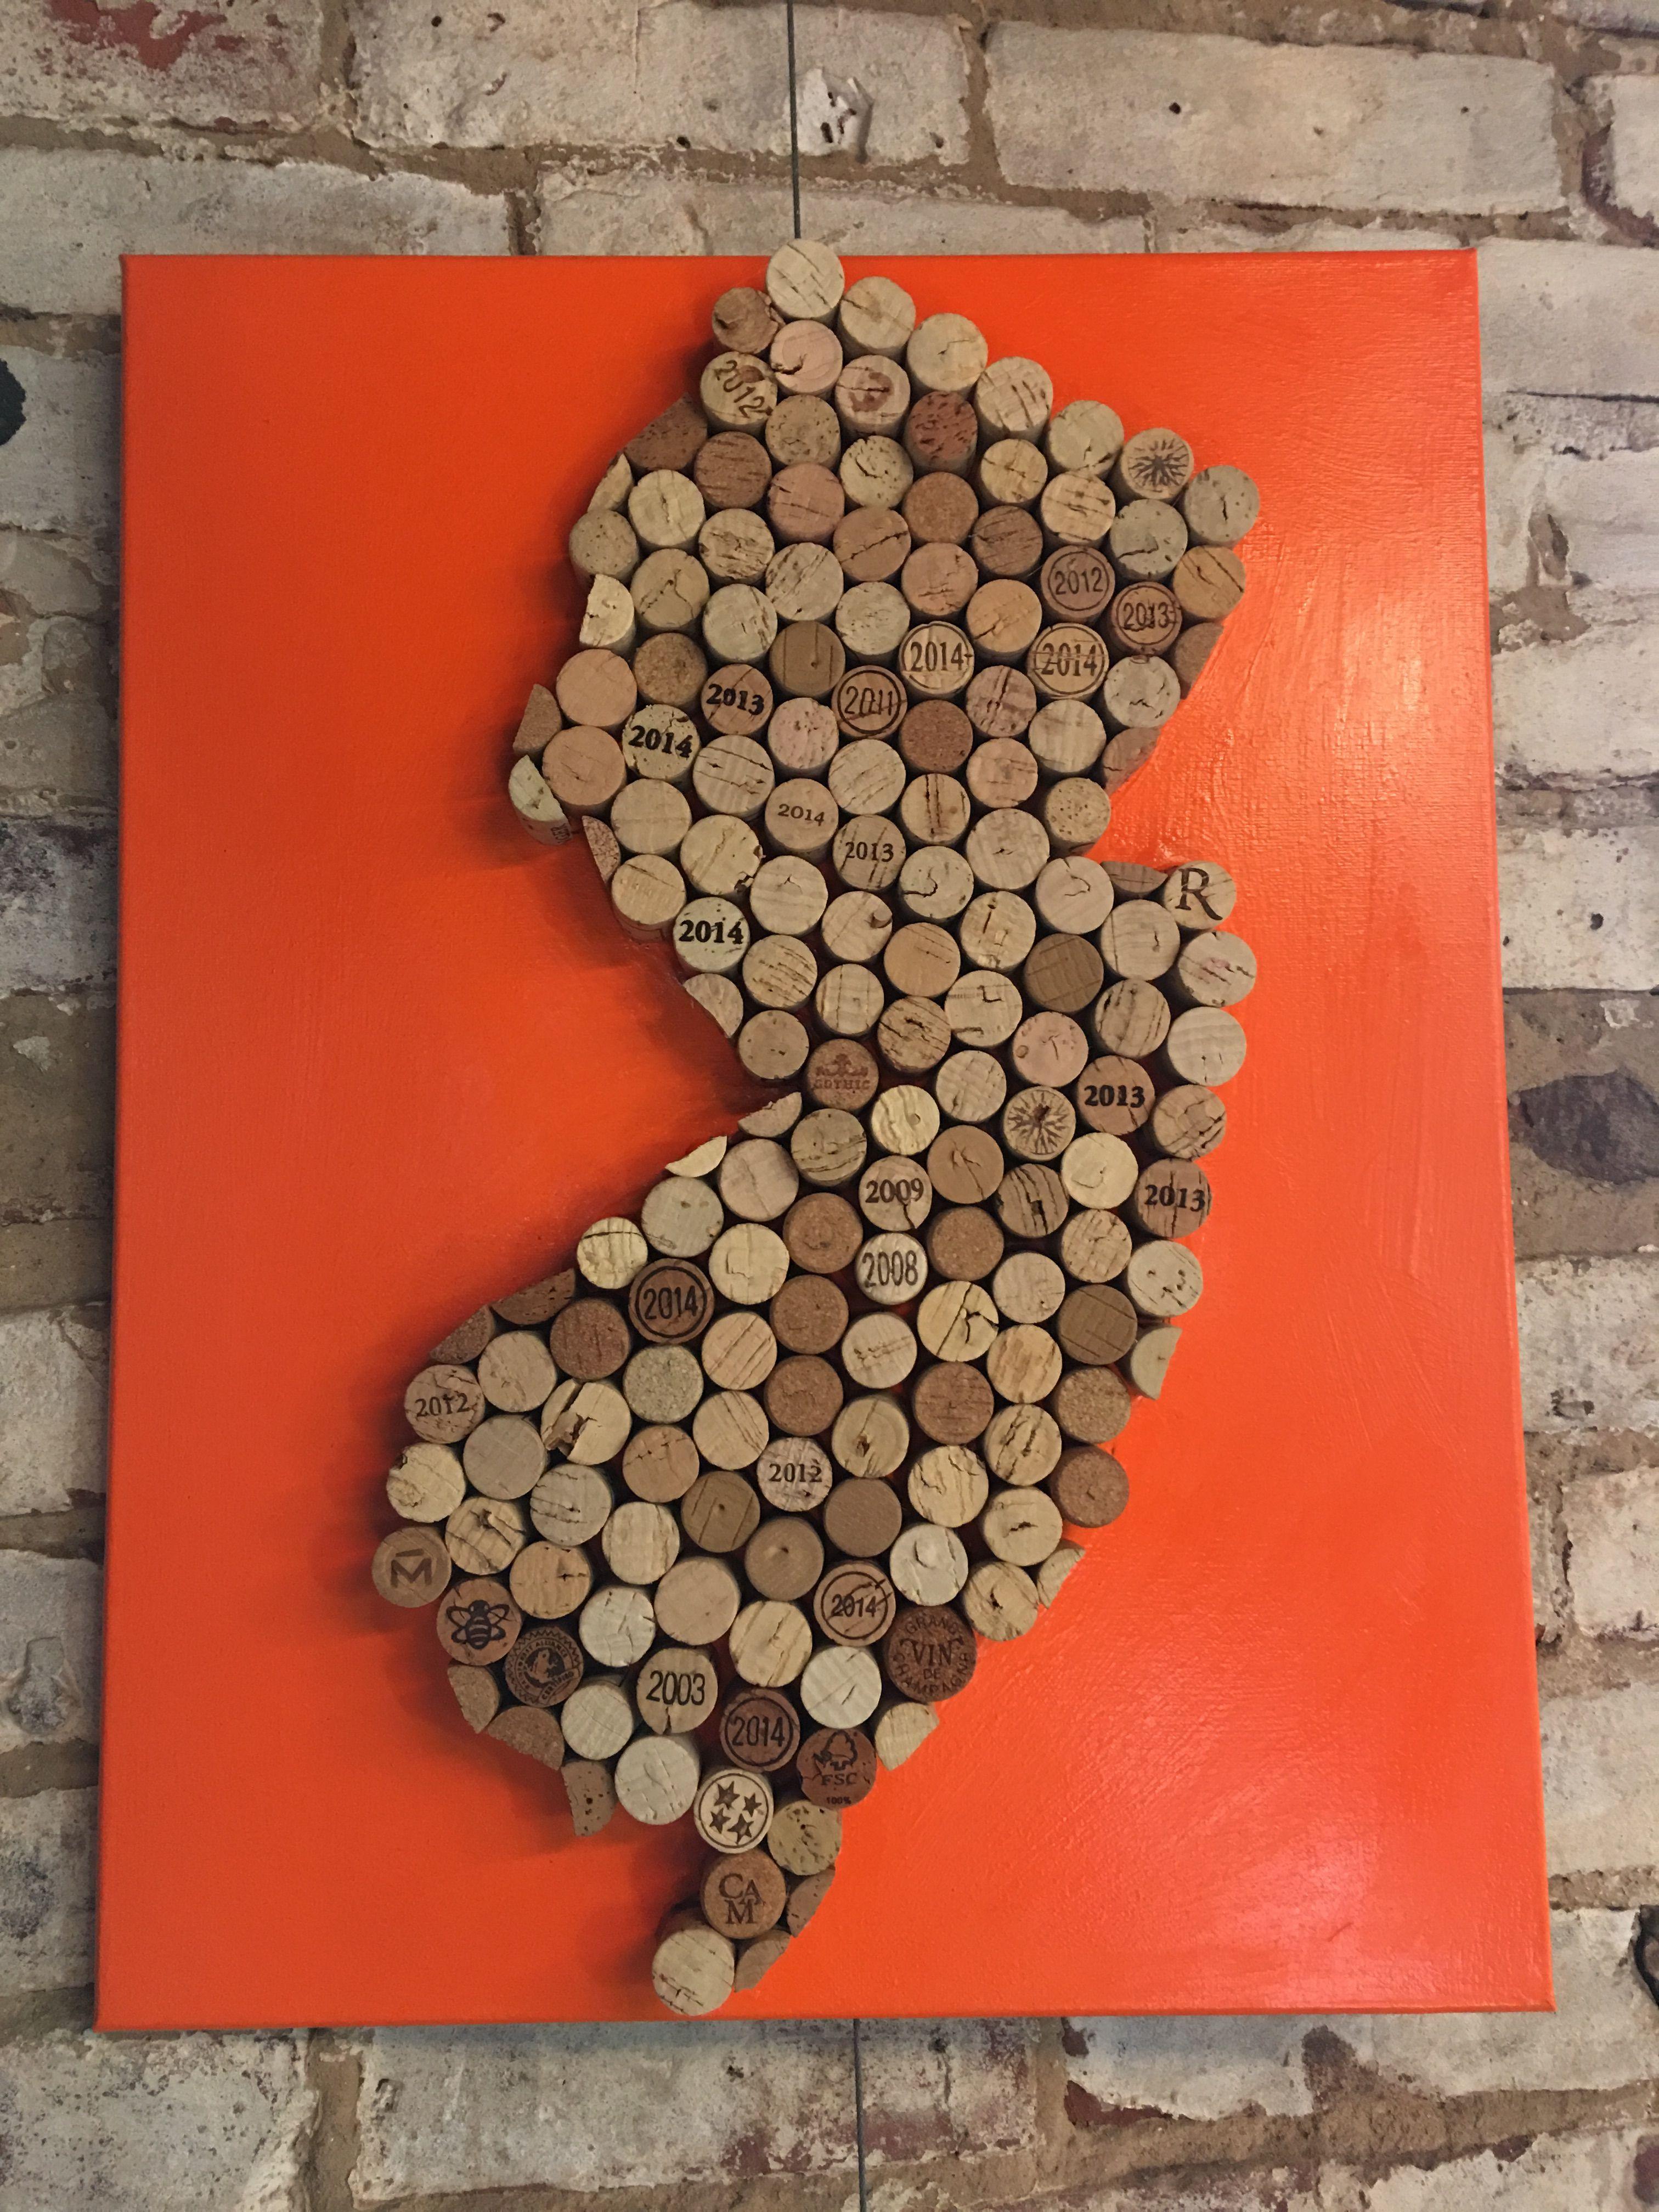 Wine Cork Artwork New Jersey Nj On Canvas Custom Made By Robin Coggins Hook Wine Sinker Co Wine Cork Arts And Crafts Crafts